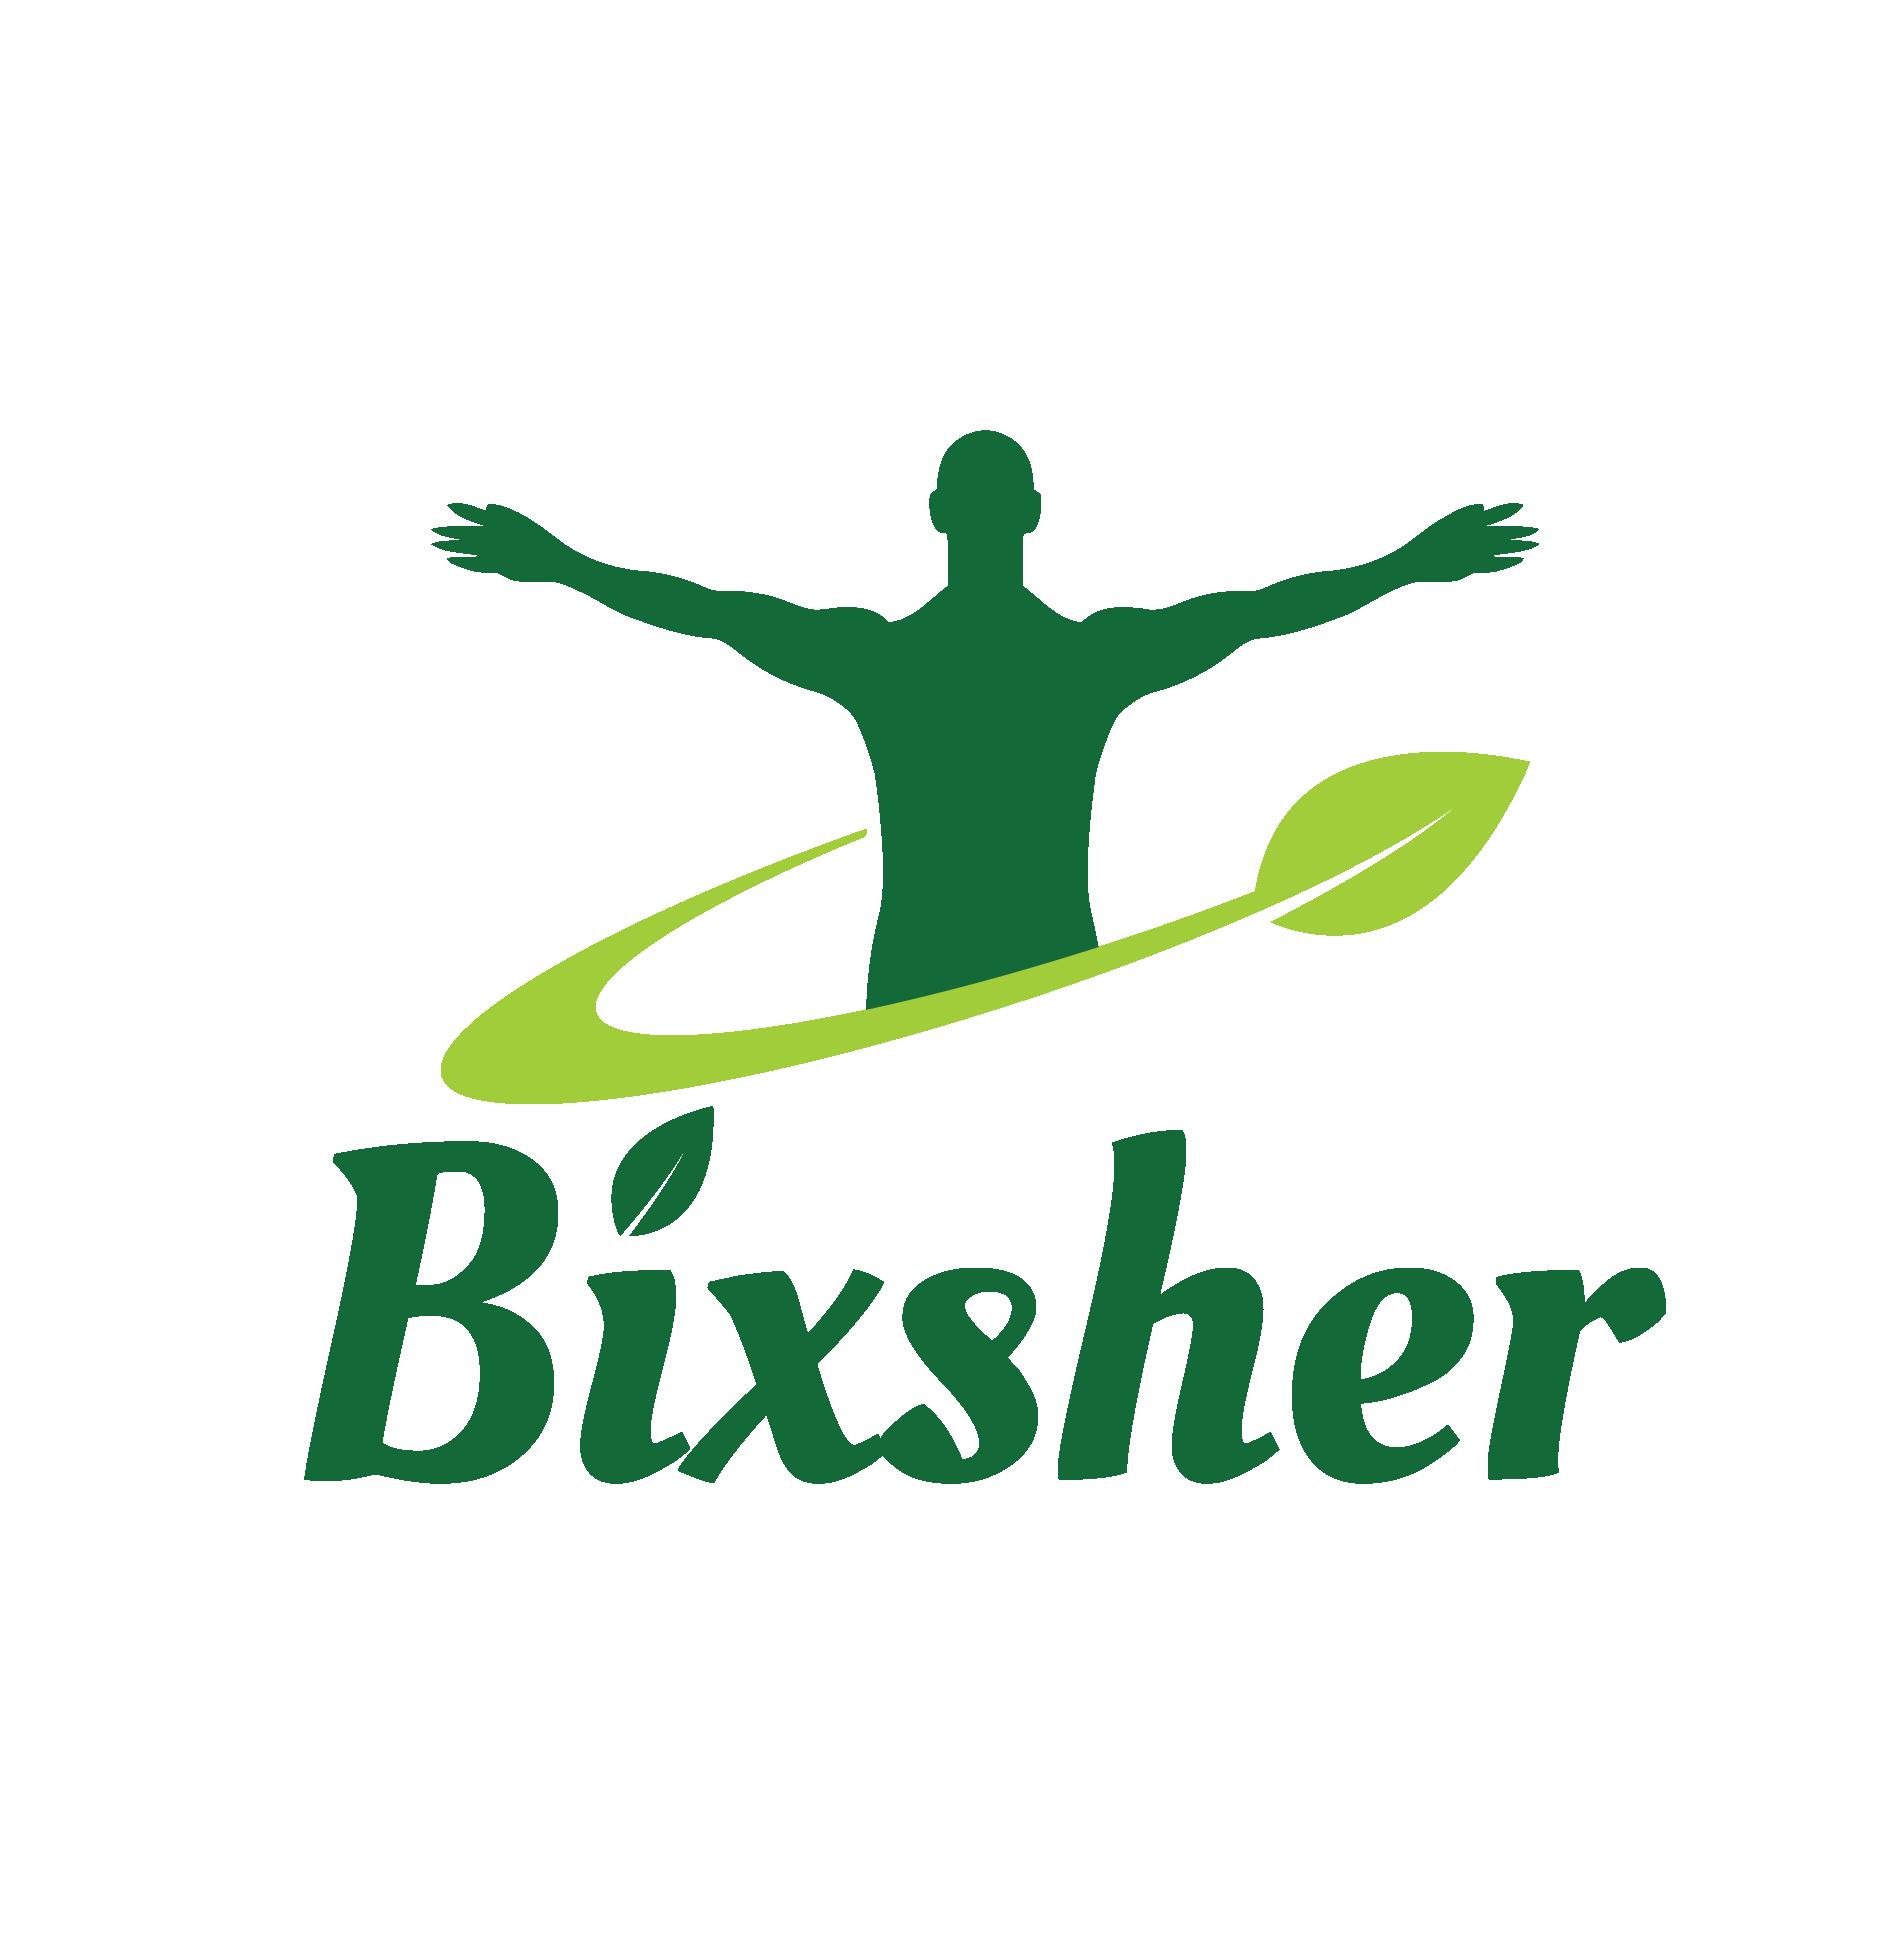 Bixsher US